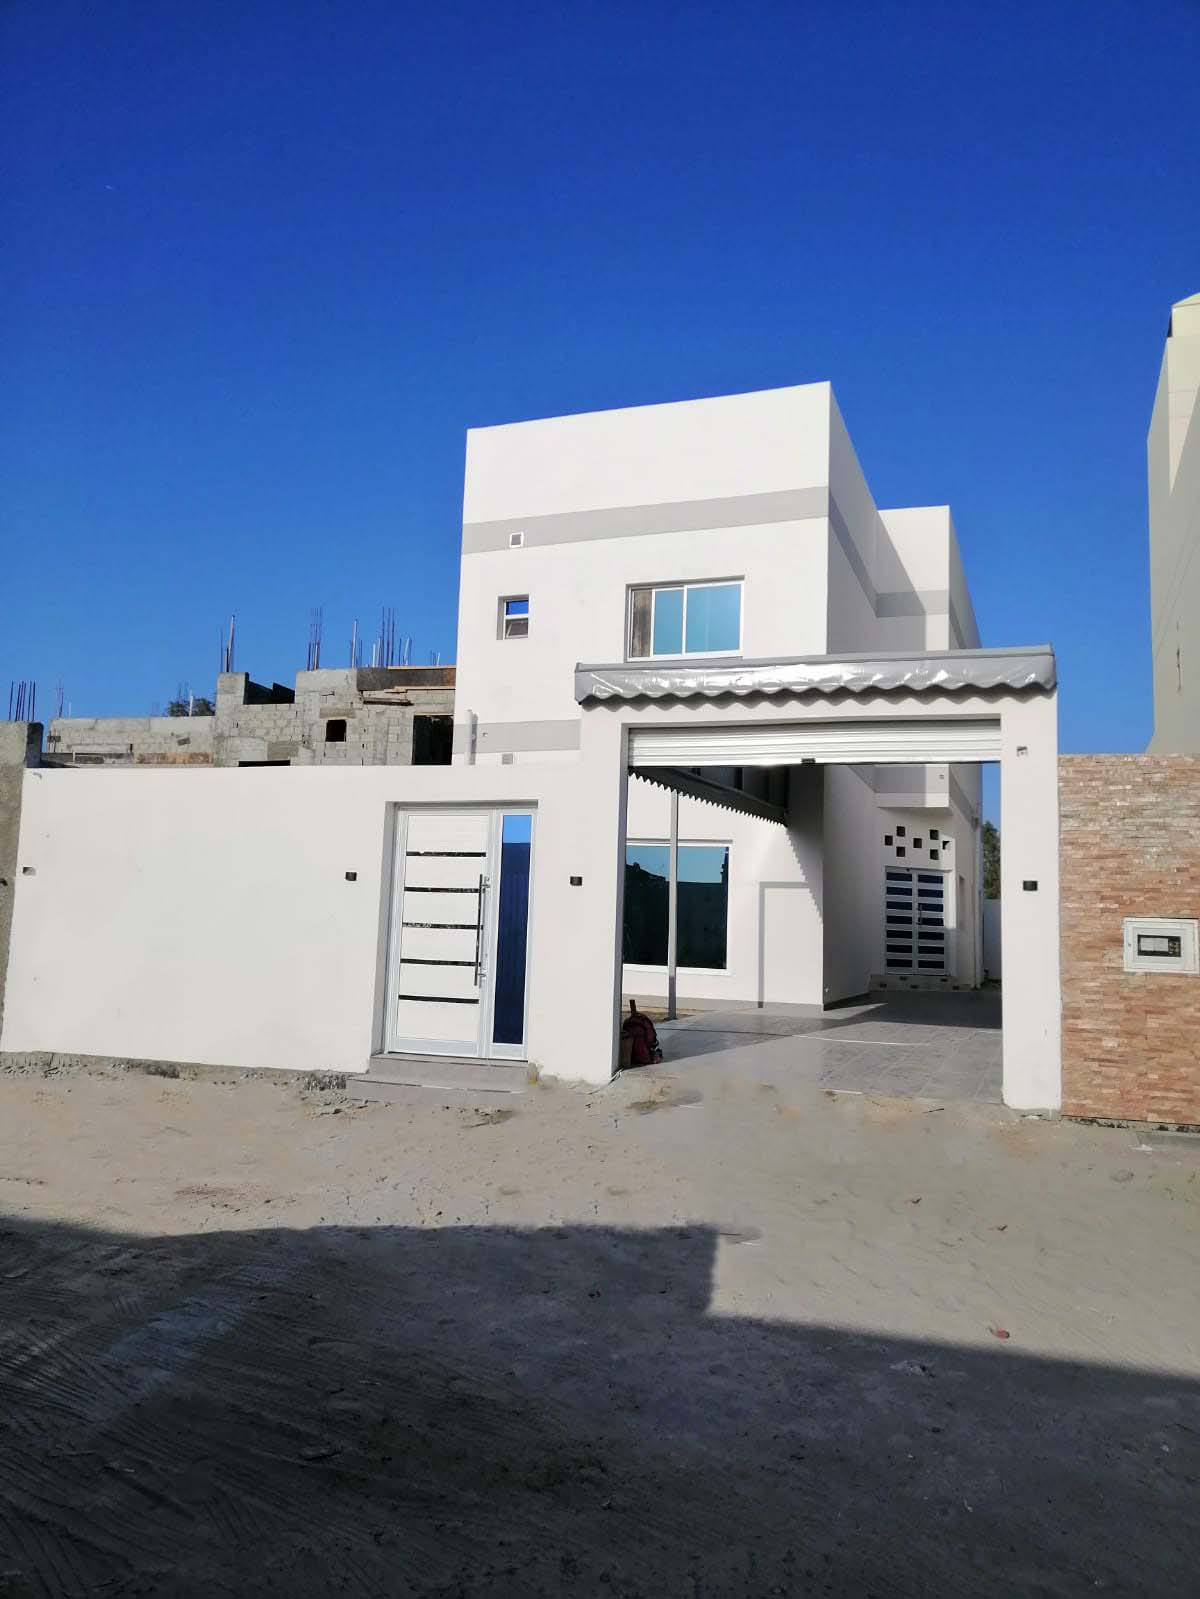 For sale new villa in Barbar Ref: BAR-ES-001